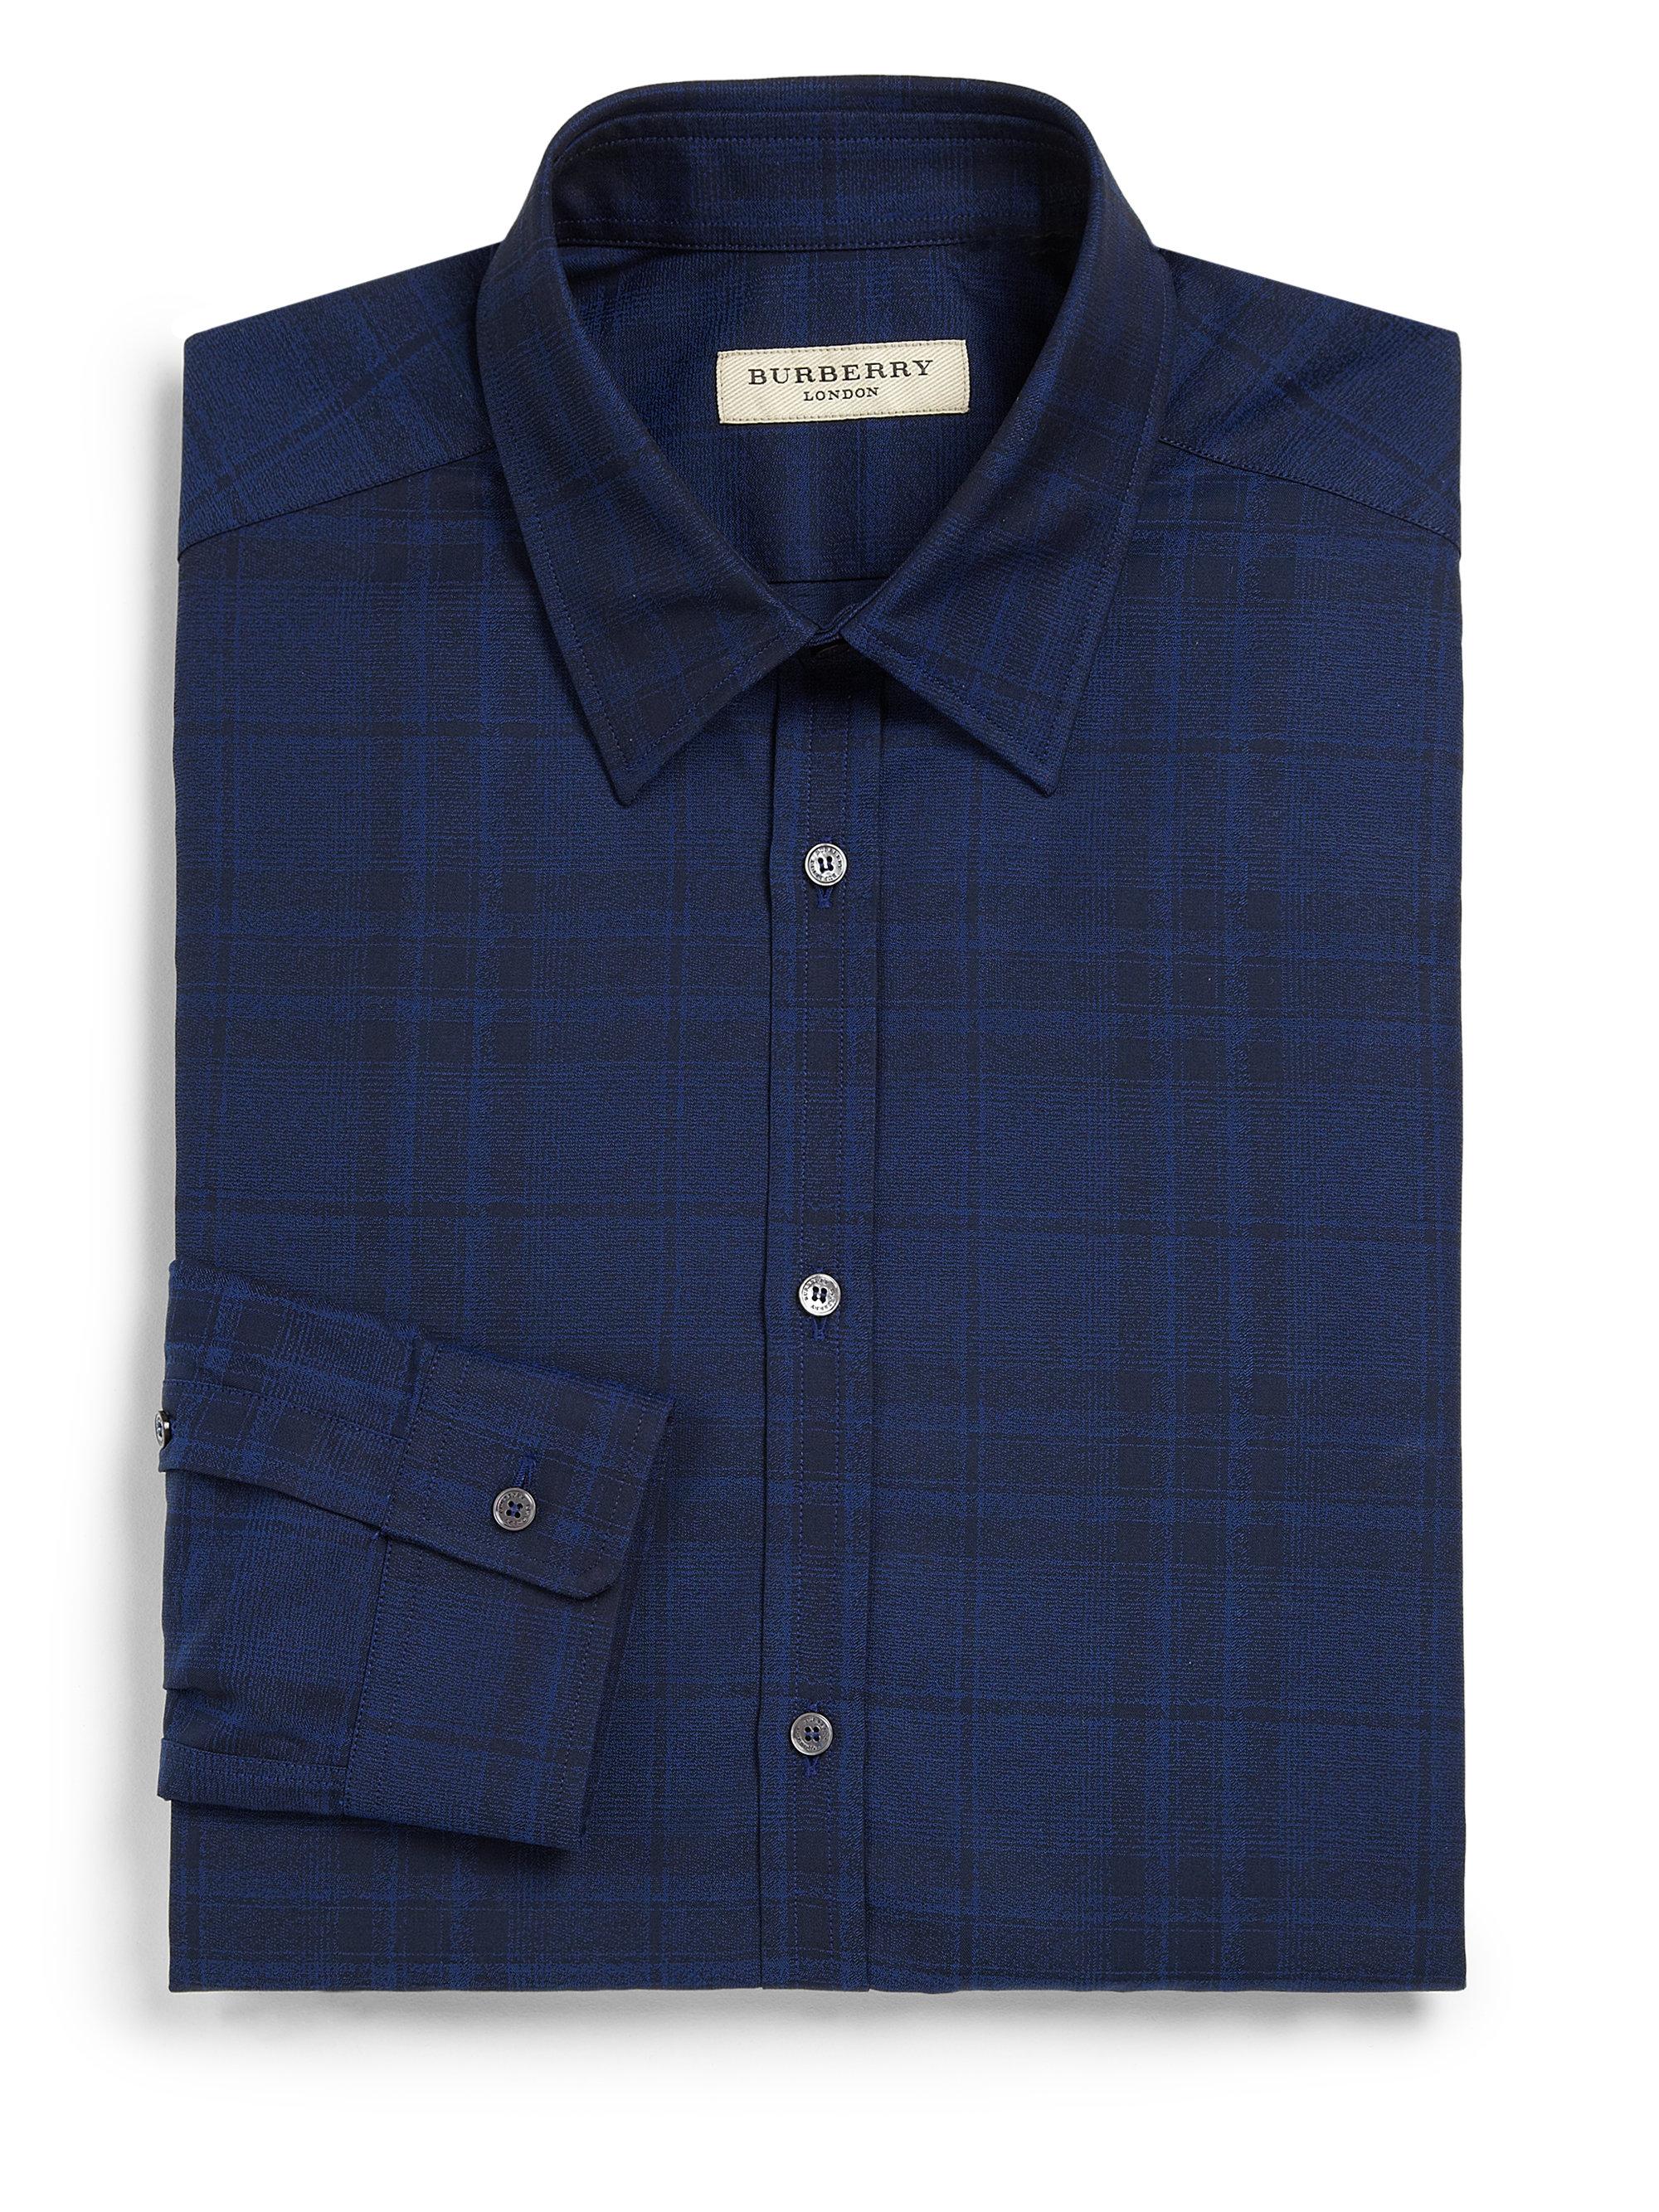 Burberry Tonal Check Dress Shirt In Blue For Men Aqua Lyst